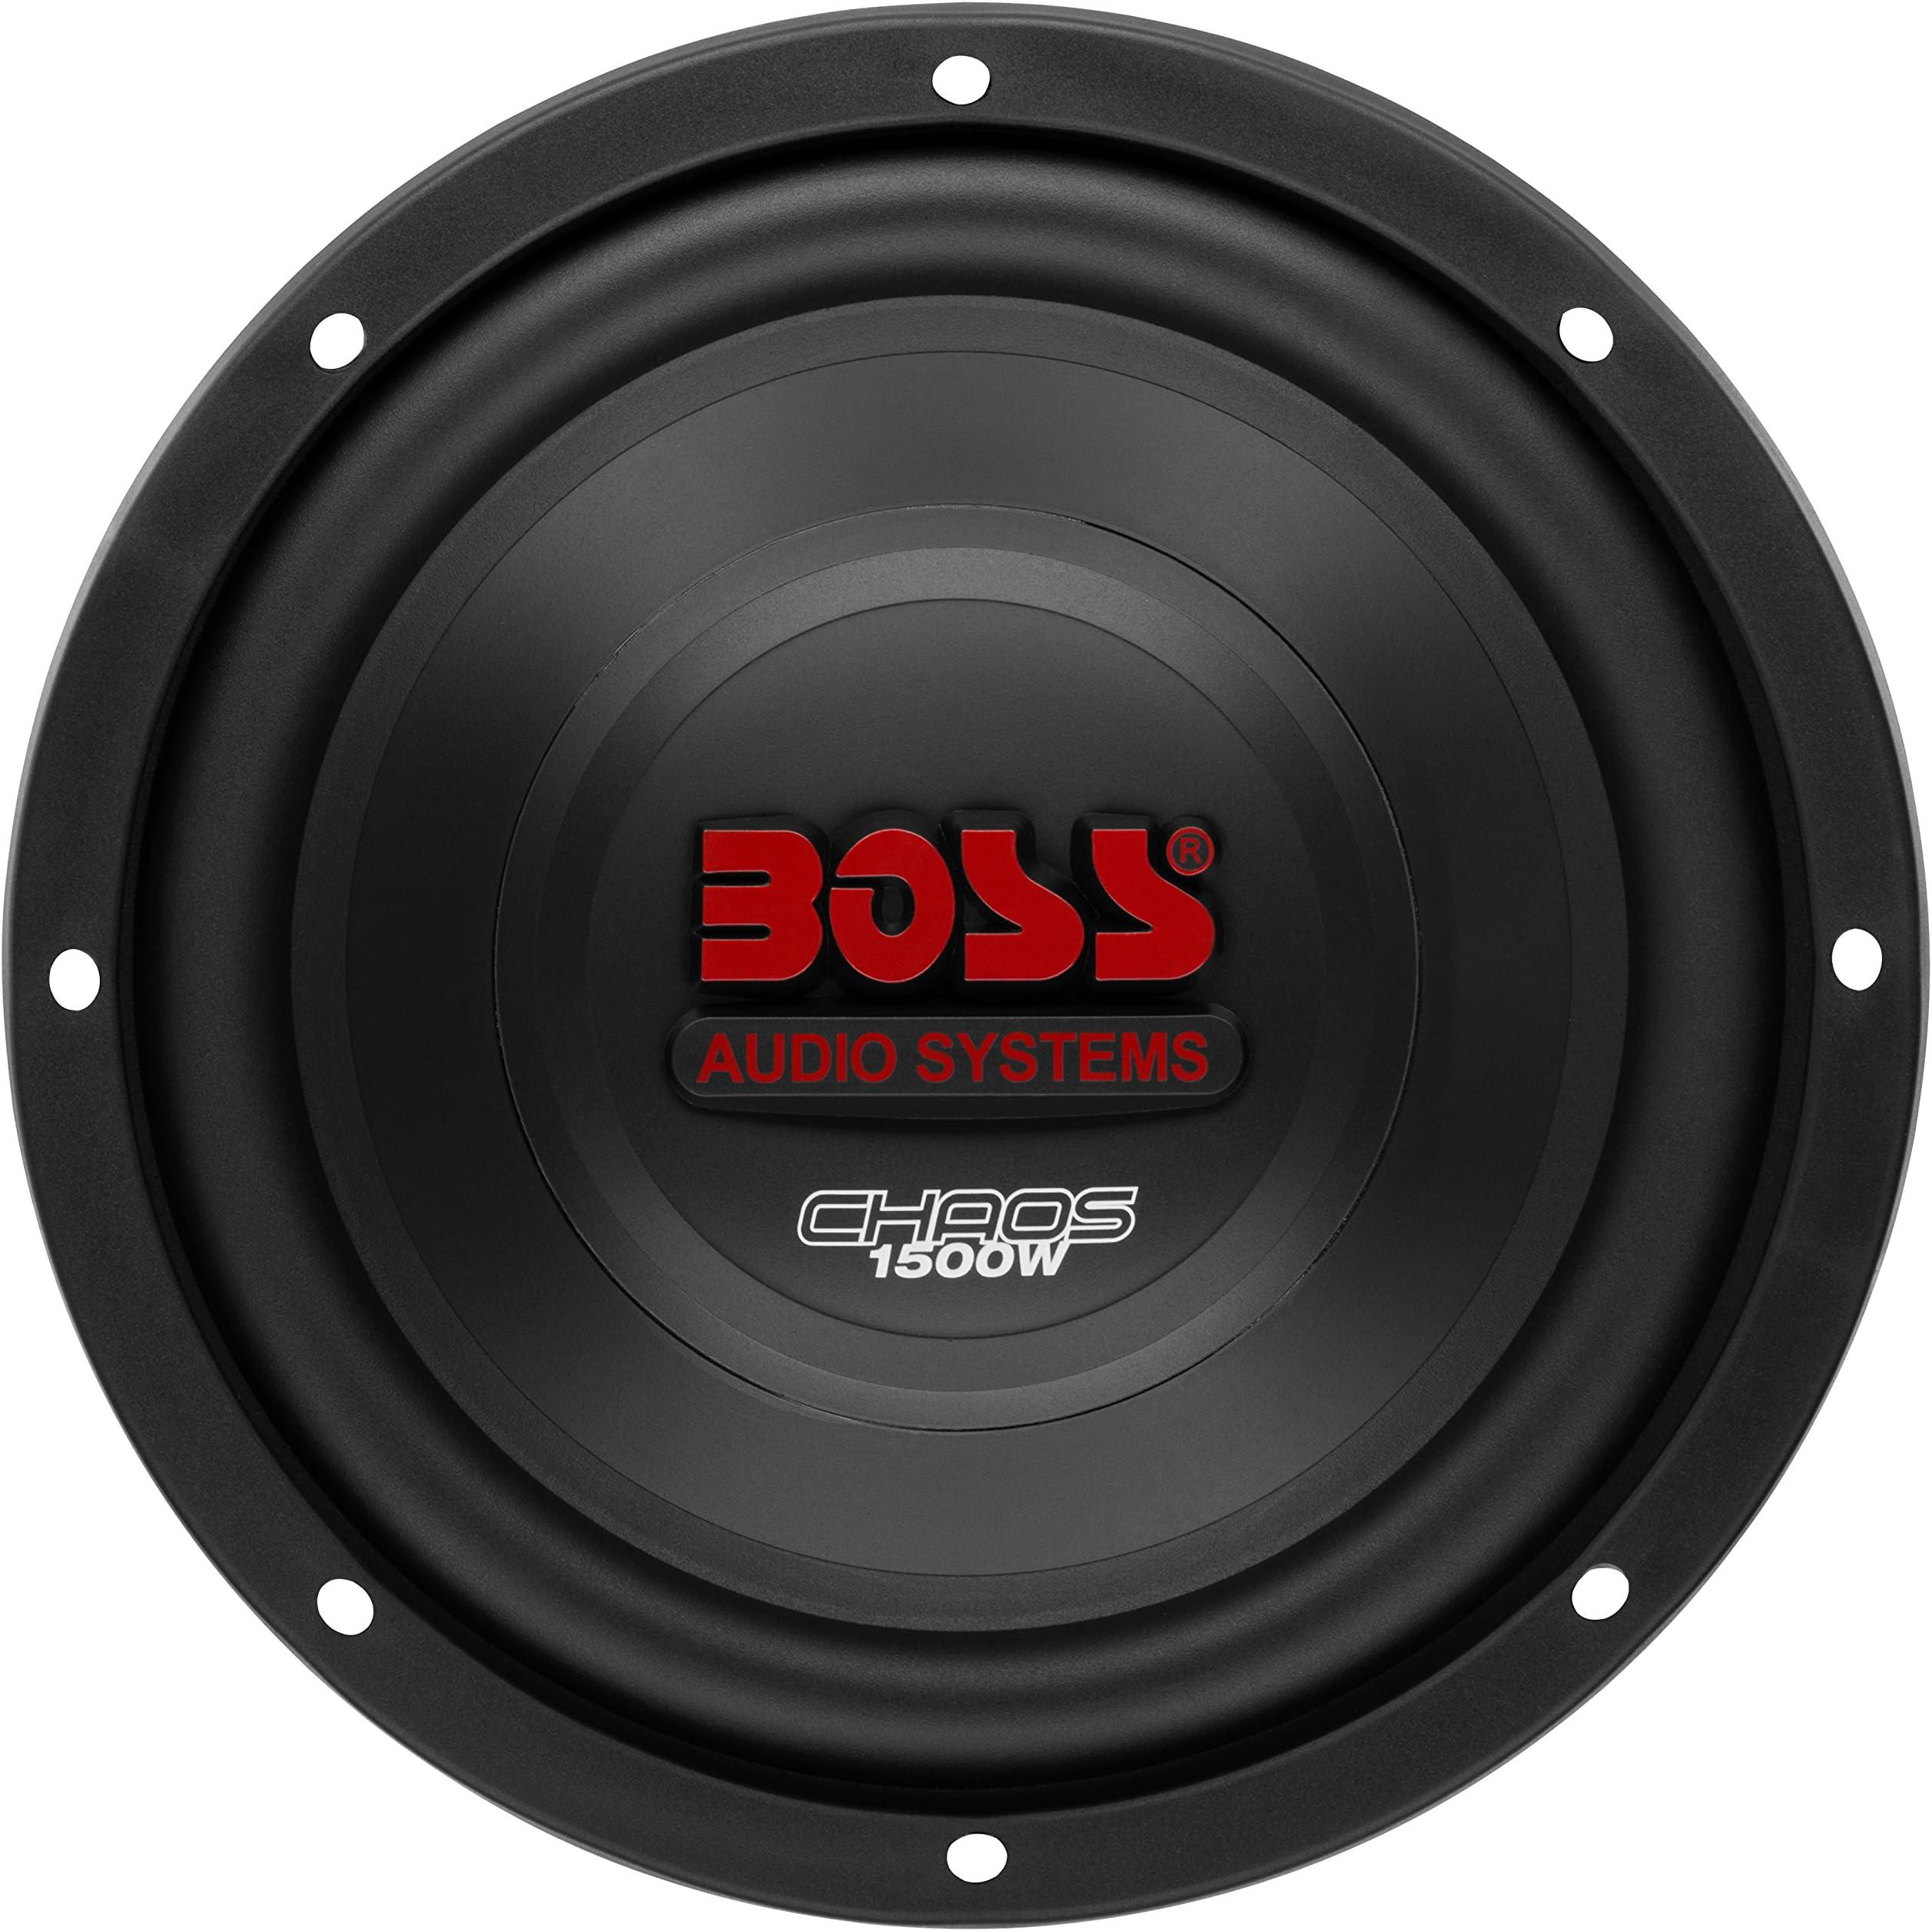 Amazon.com: BOSS Audio Systems CH10DVC 1500 Watt, 10 Inch, Dual 4 Ohm Voice  Coil Car Subwoofer: Car ElectronicsAmazon.com